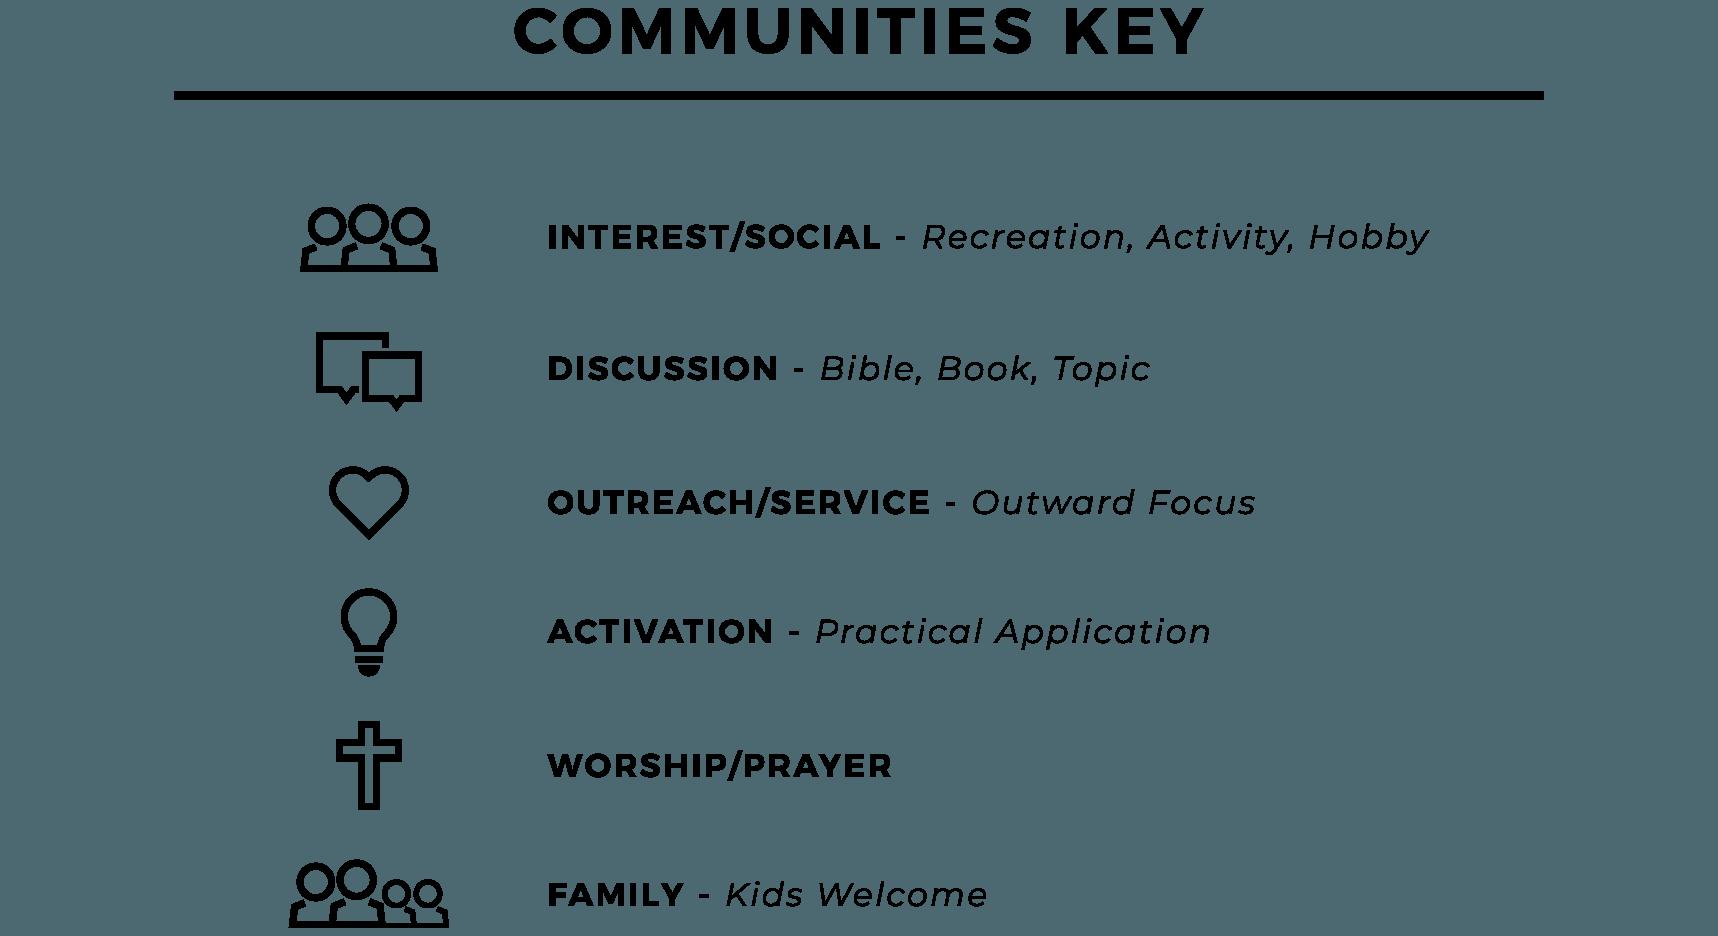 communities_key.png